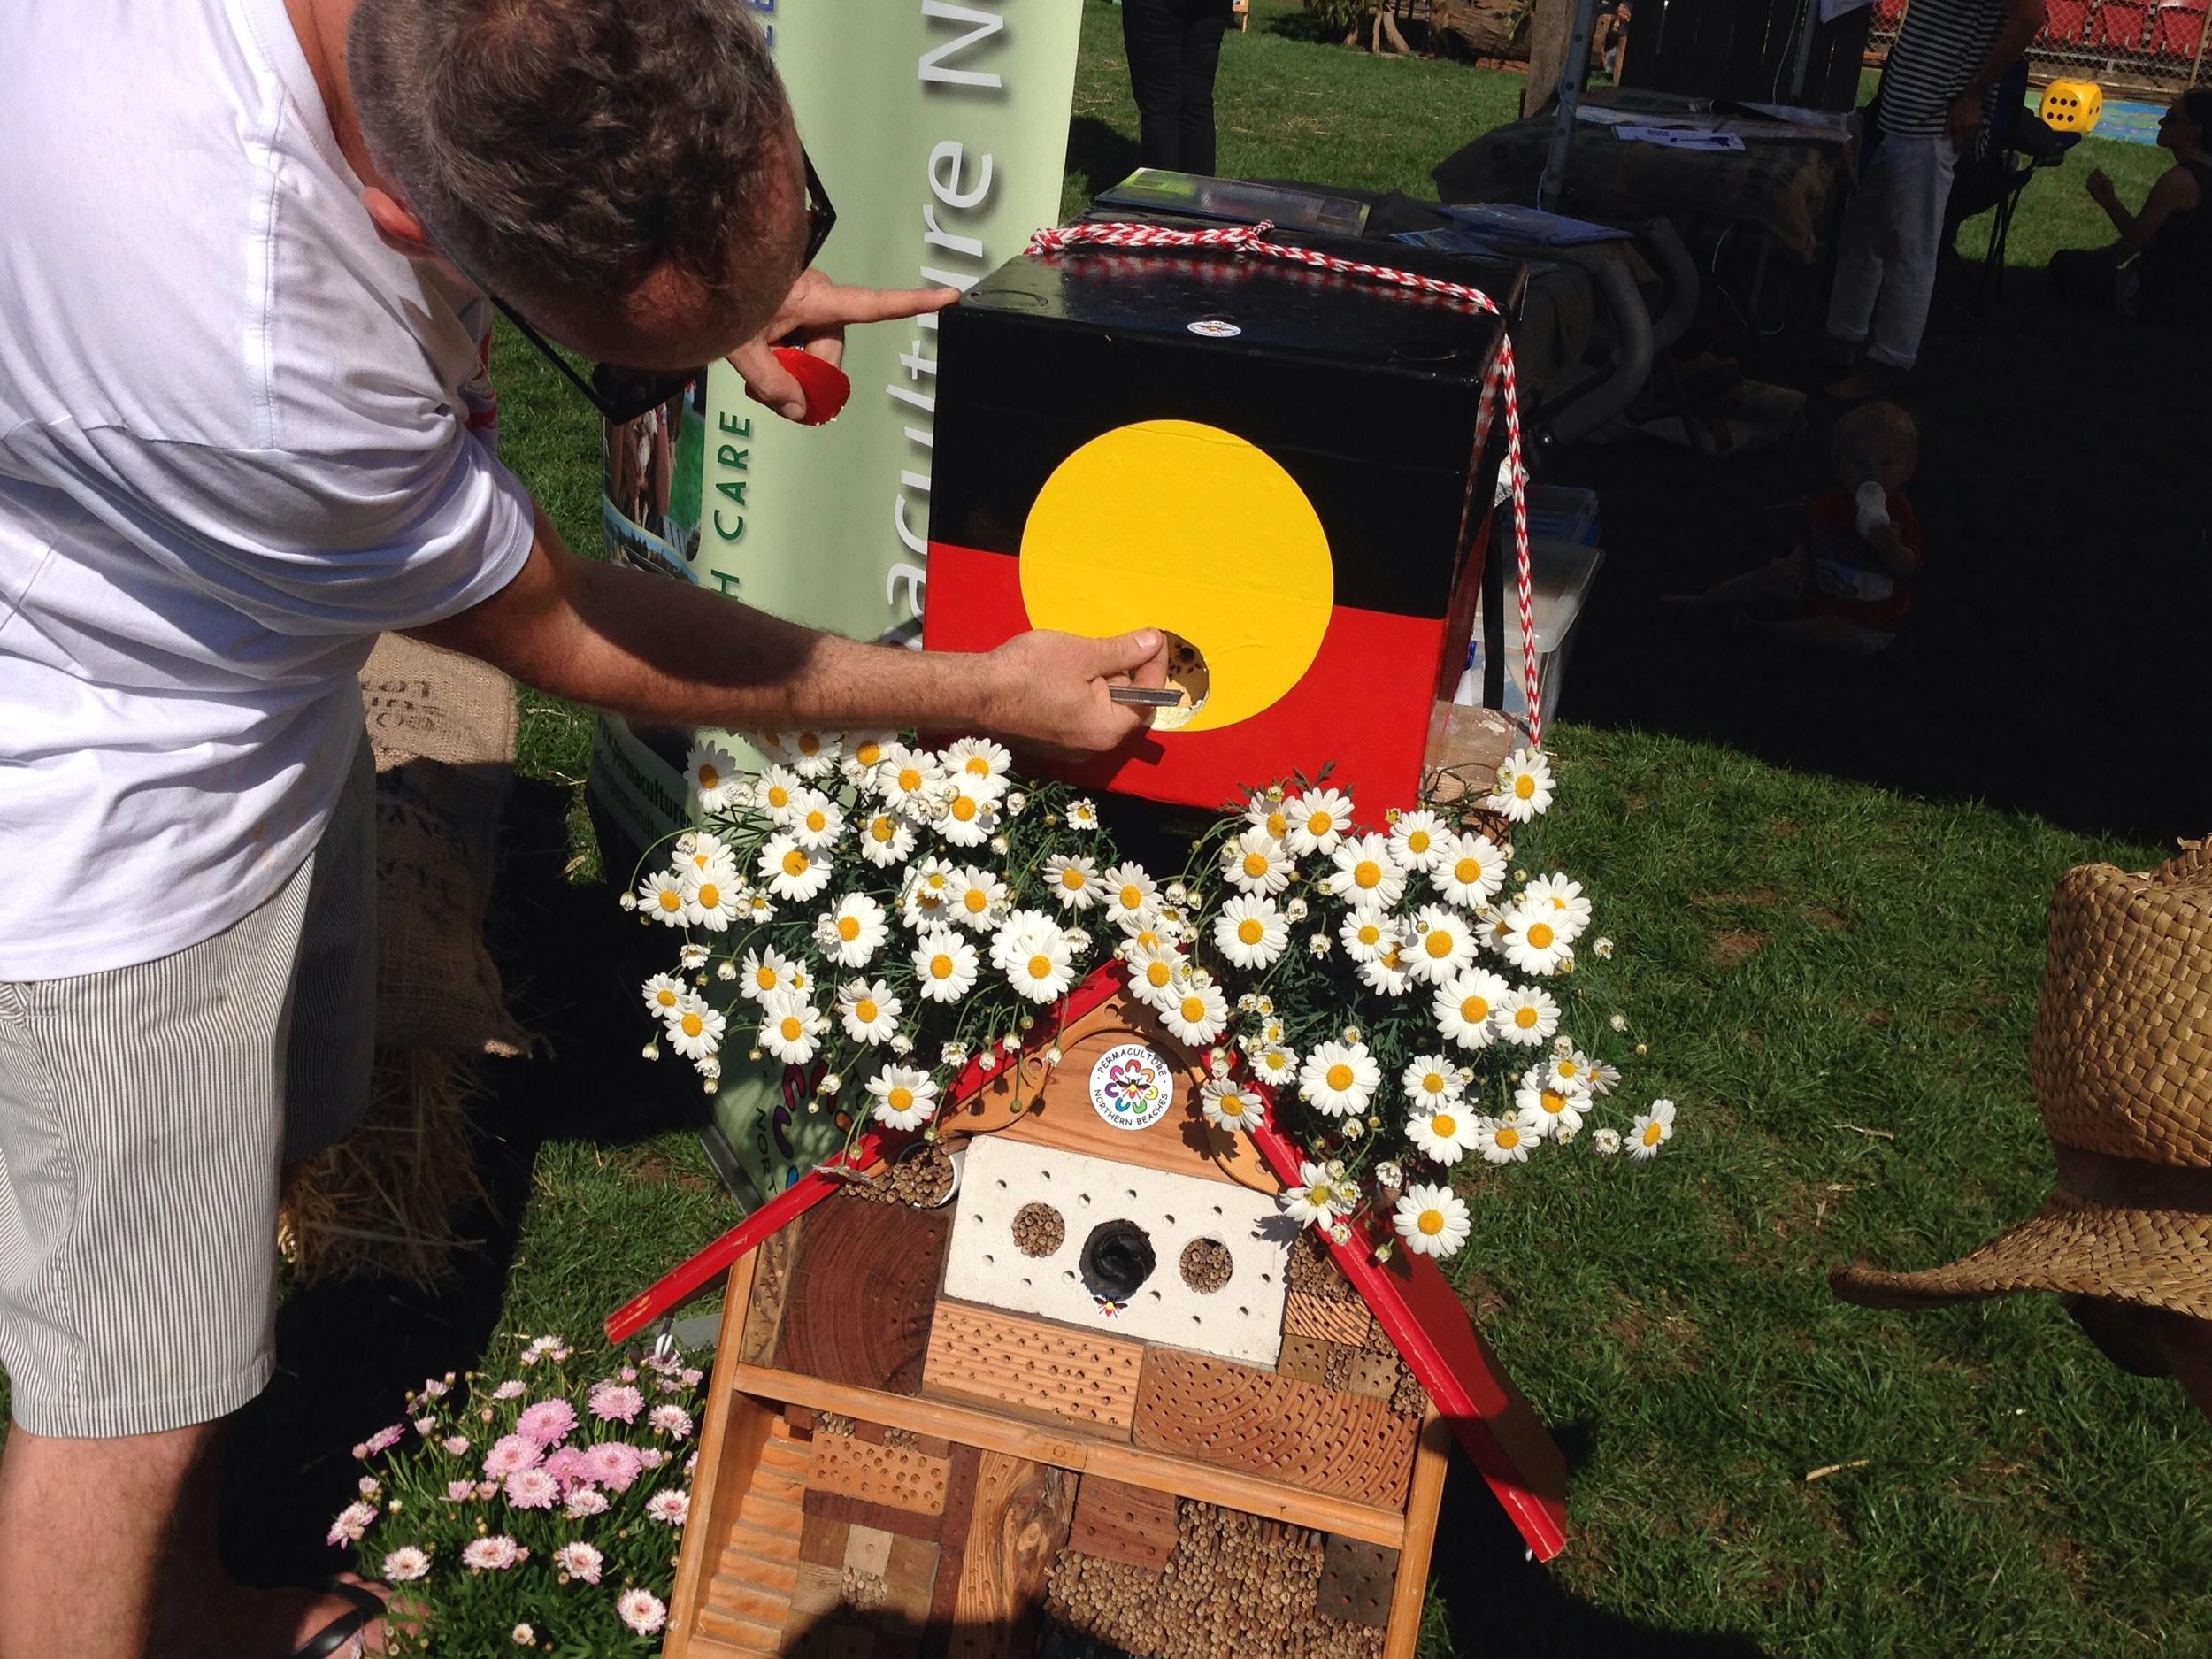 Dan opening the native stingless bee hive